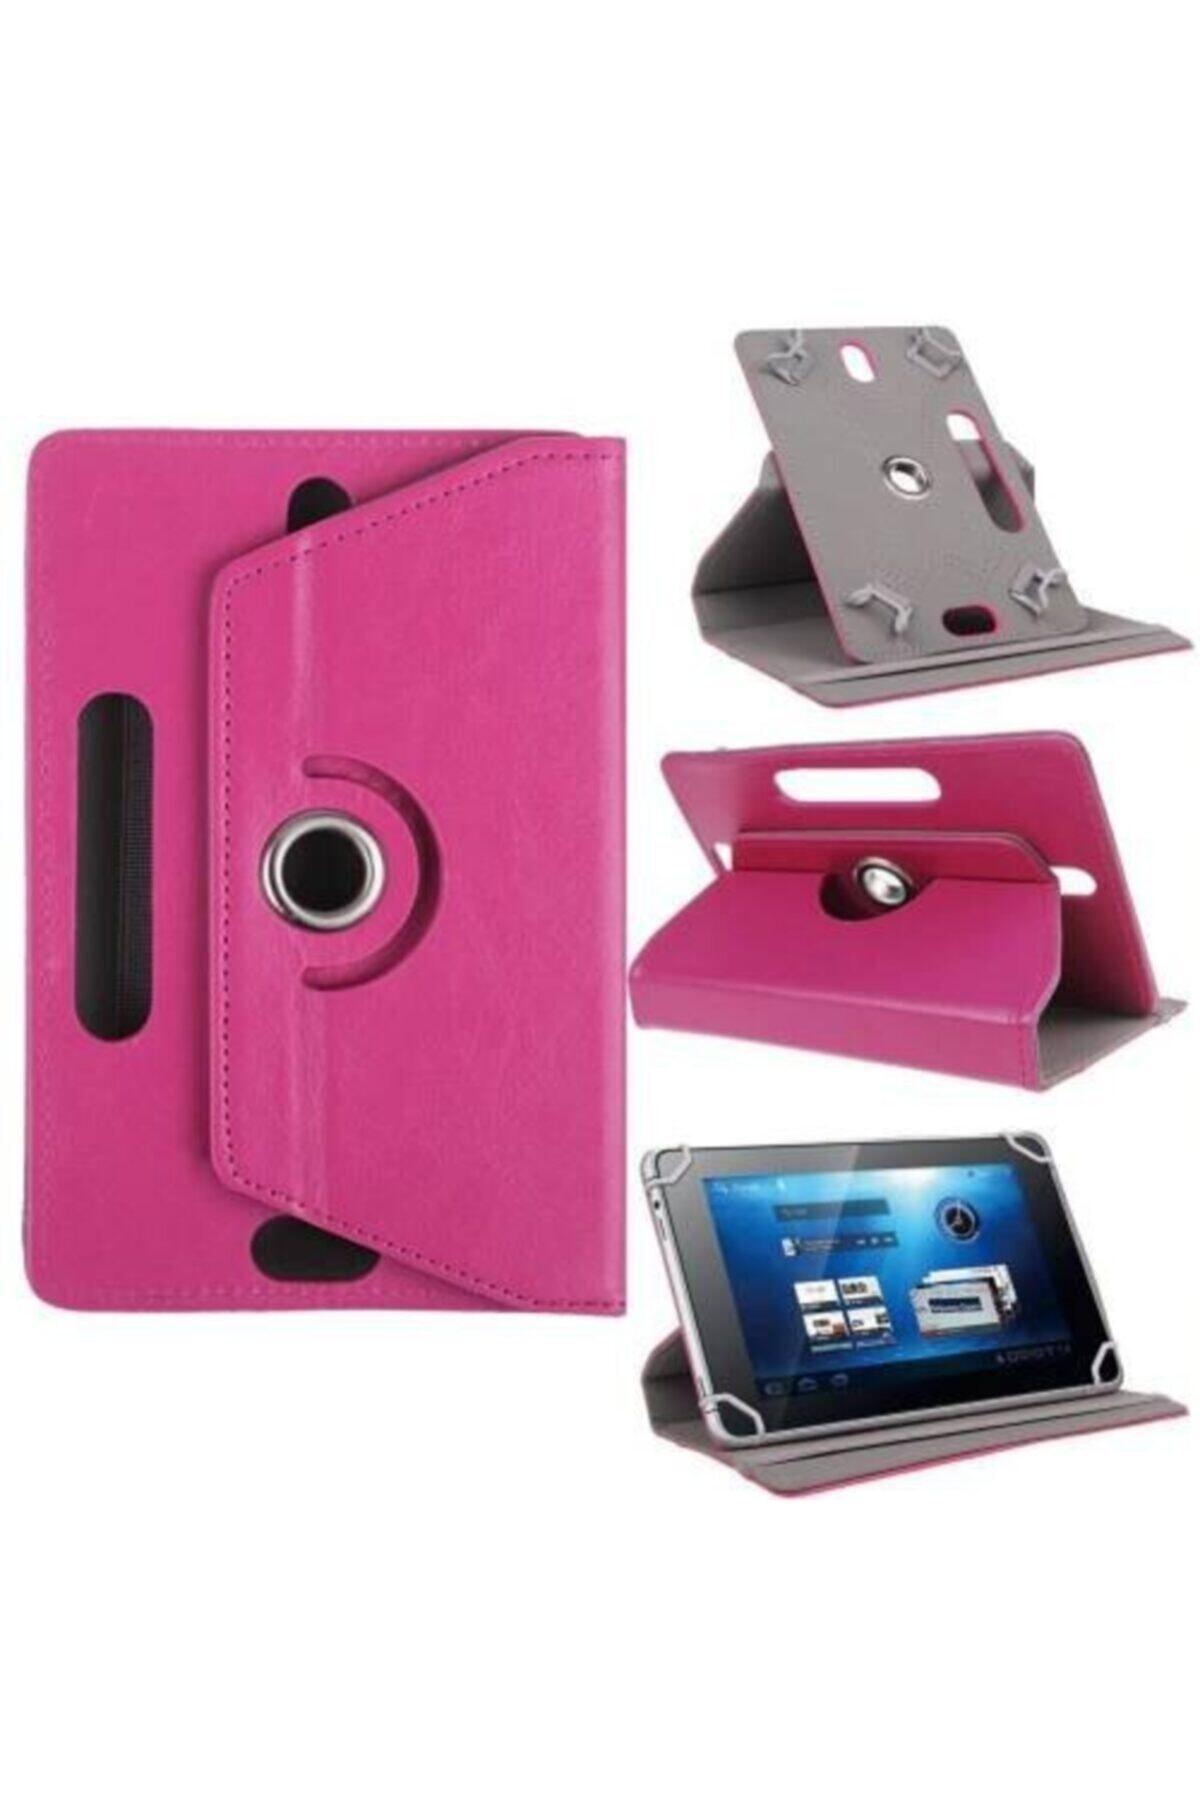 Mobillan Iletişim Pembe Hometech Alfa 7m 7'' Inç Üniversal Stand Olabilen Tablet Kılıf